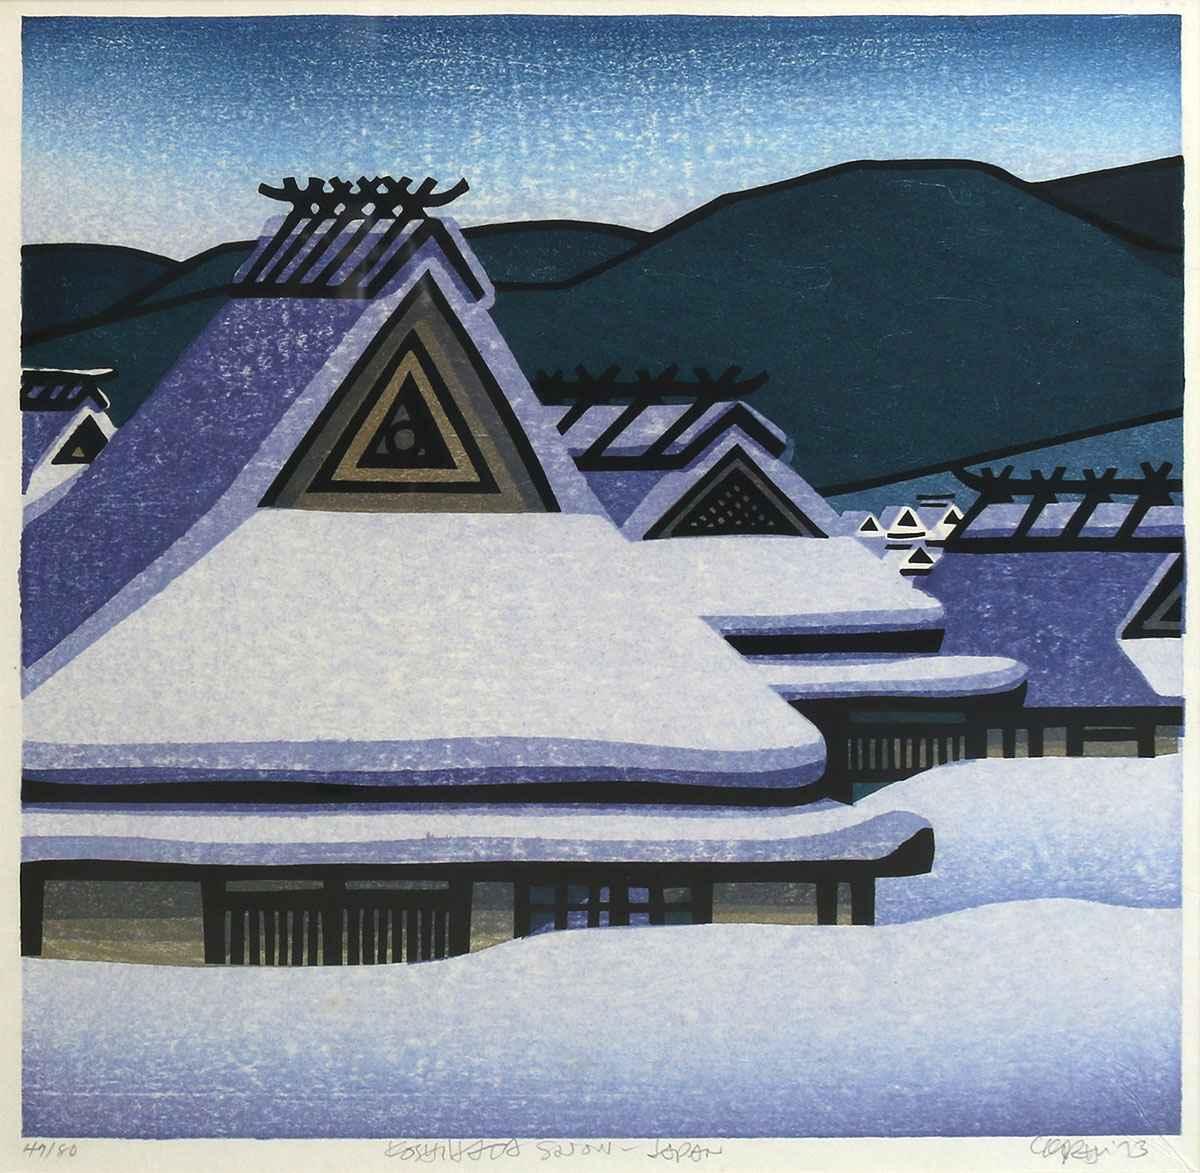 Koshihata Snow-Japan by  Clifton Karhu - Masterpiece Online